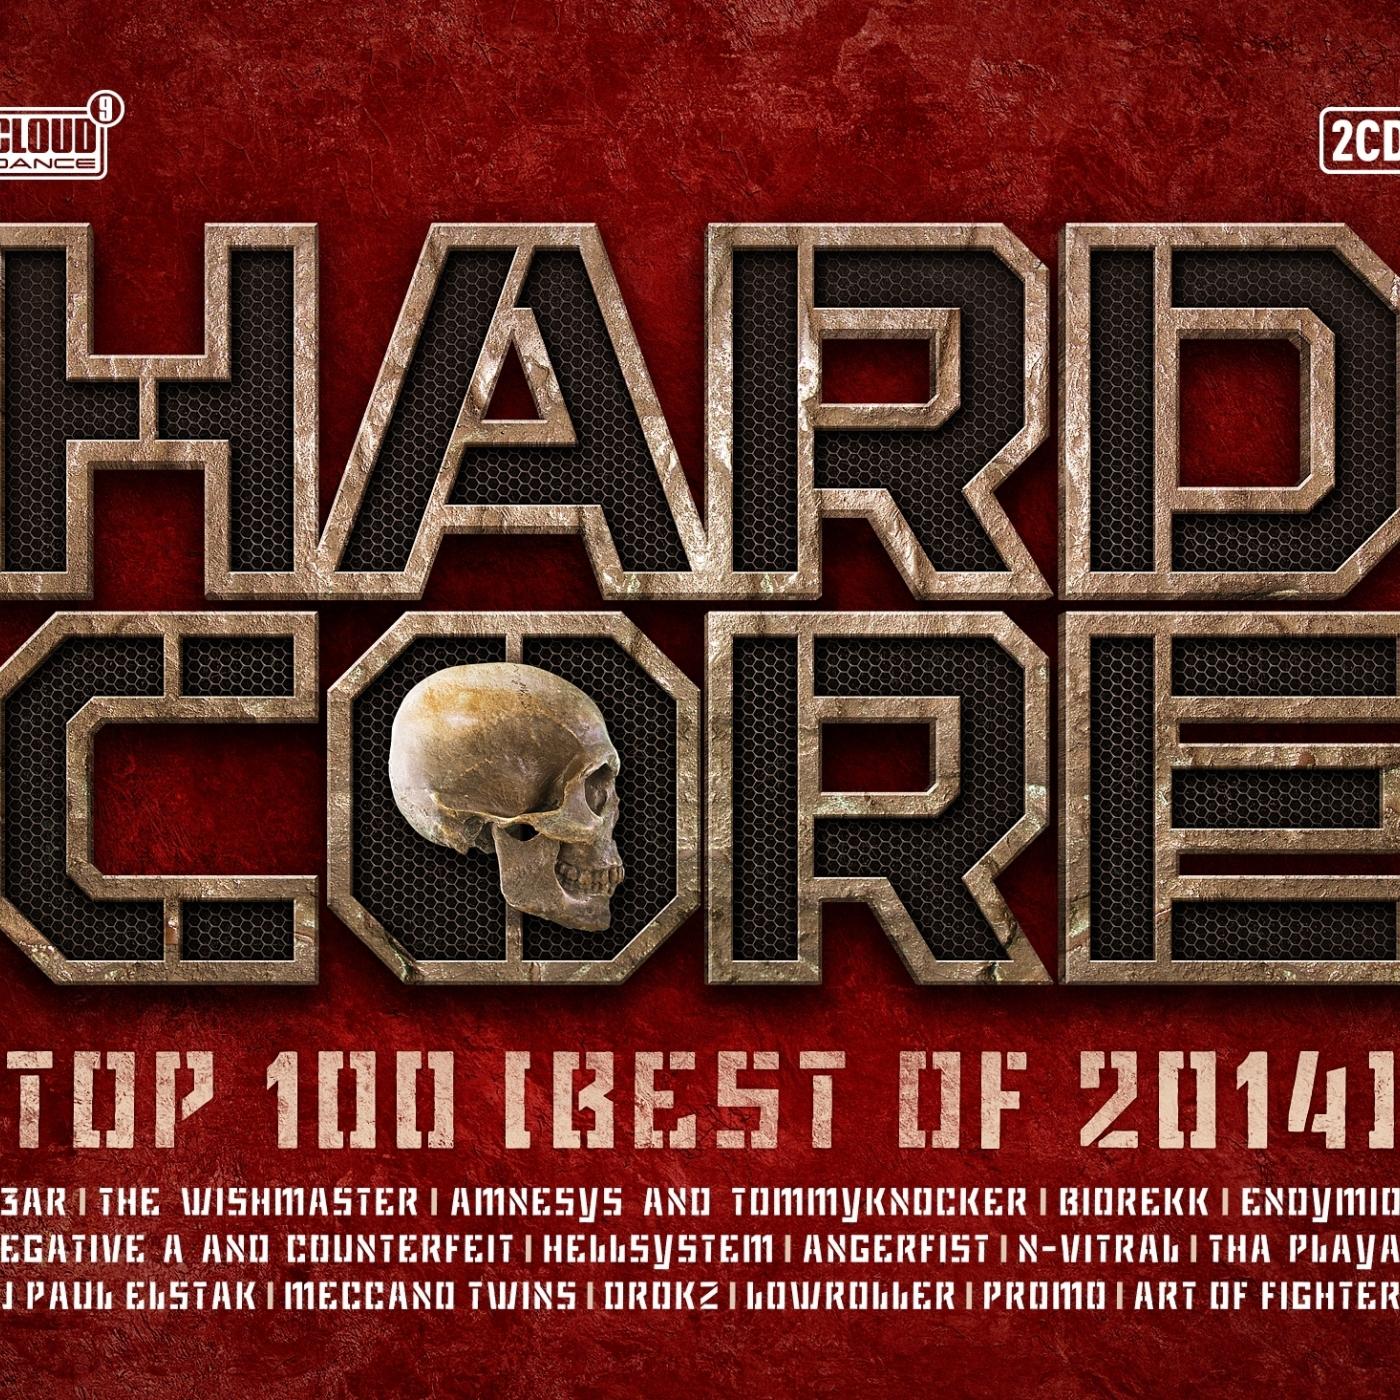 Hardcore Top 100 best of 2014 (CLDM2014029) CD - Rigeshop